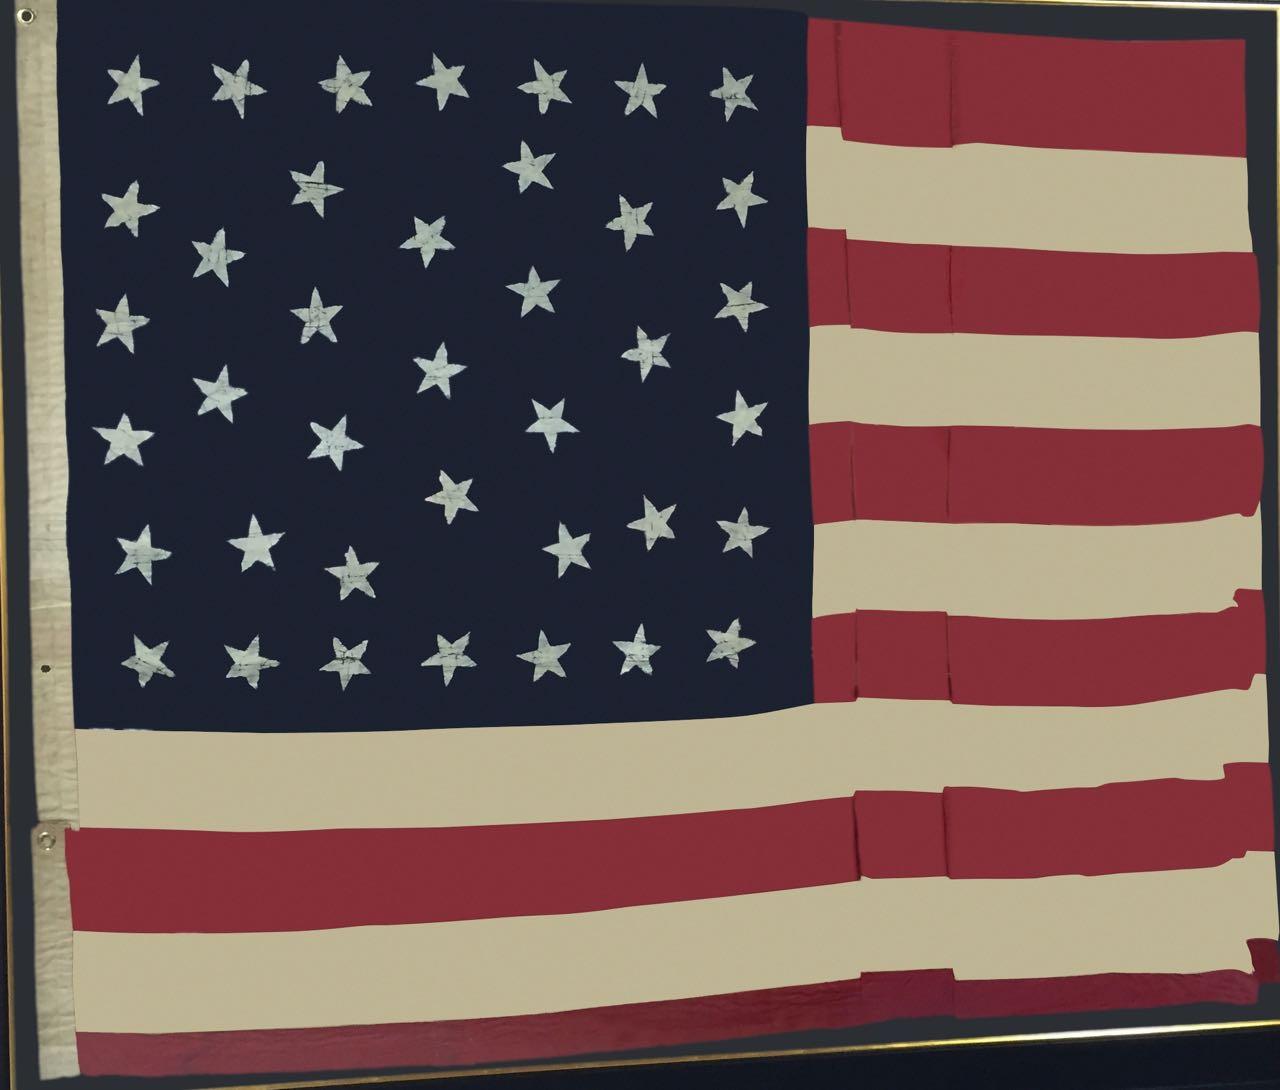 ANTIQUE 39 STAR FLAG IMAGE